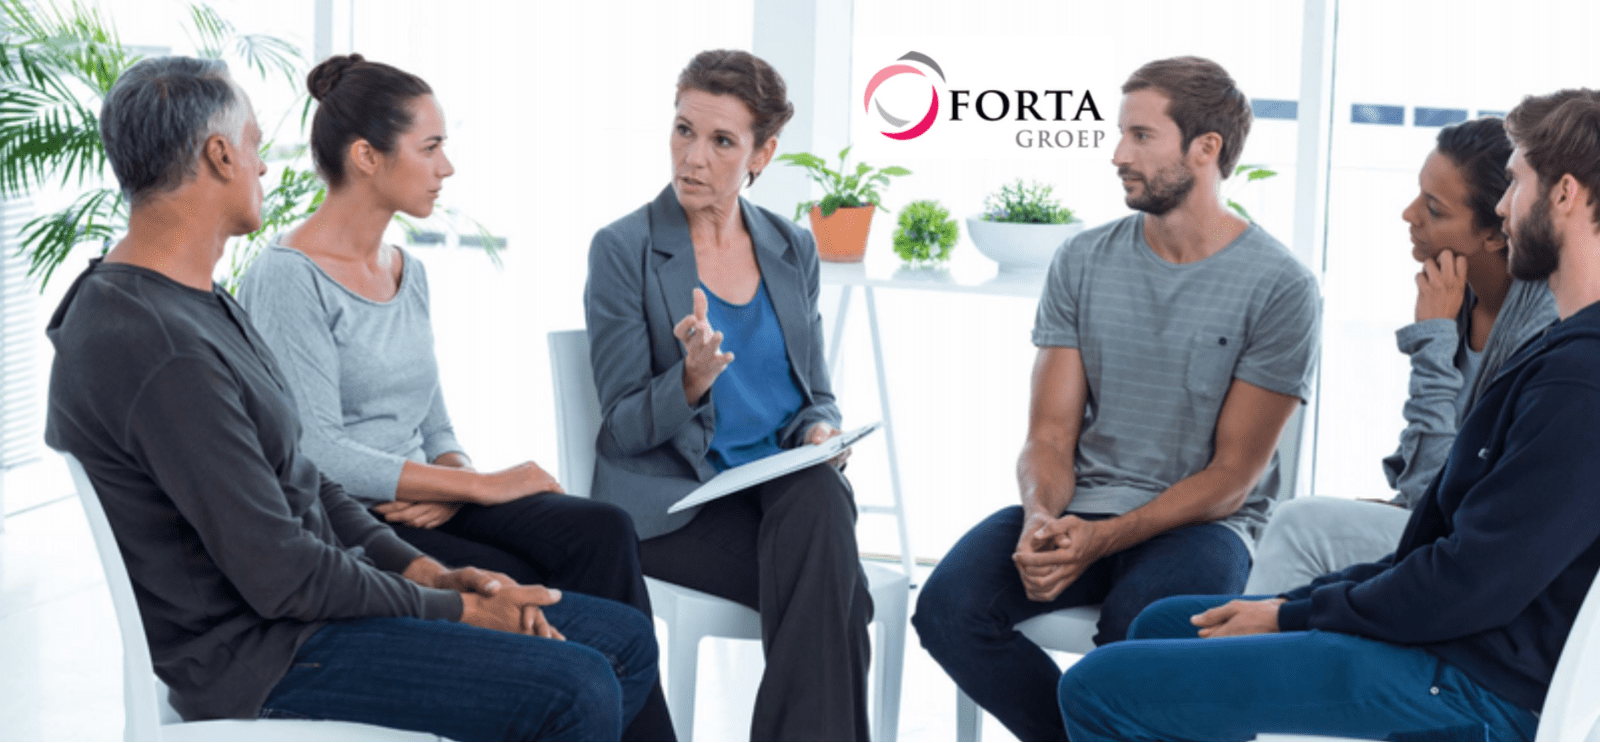 FortaGroep klantcase GGZ vernieuwd printerpark